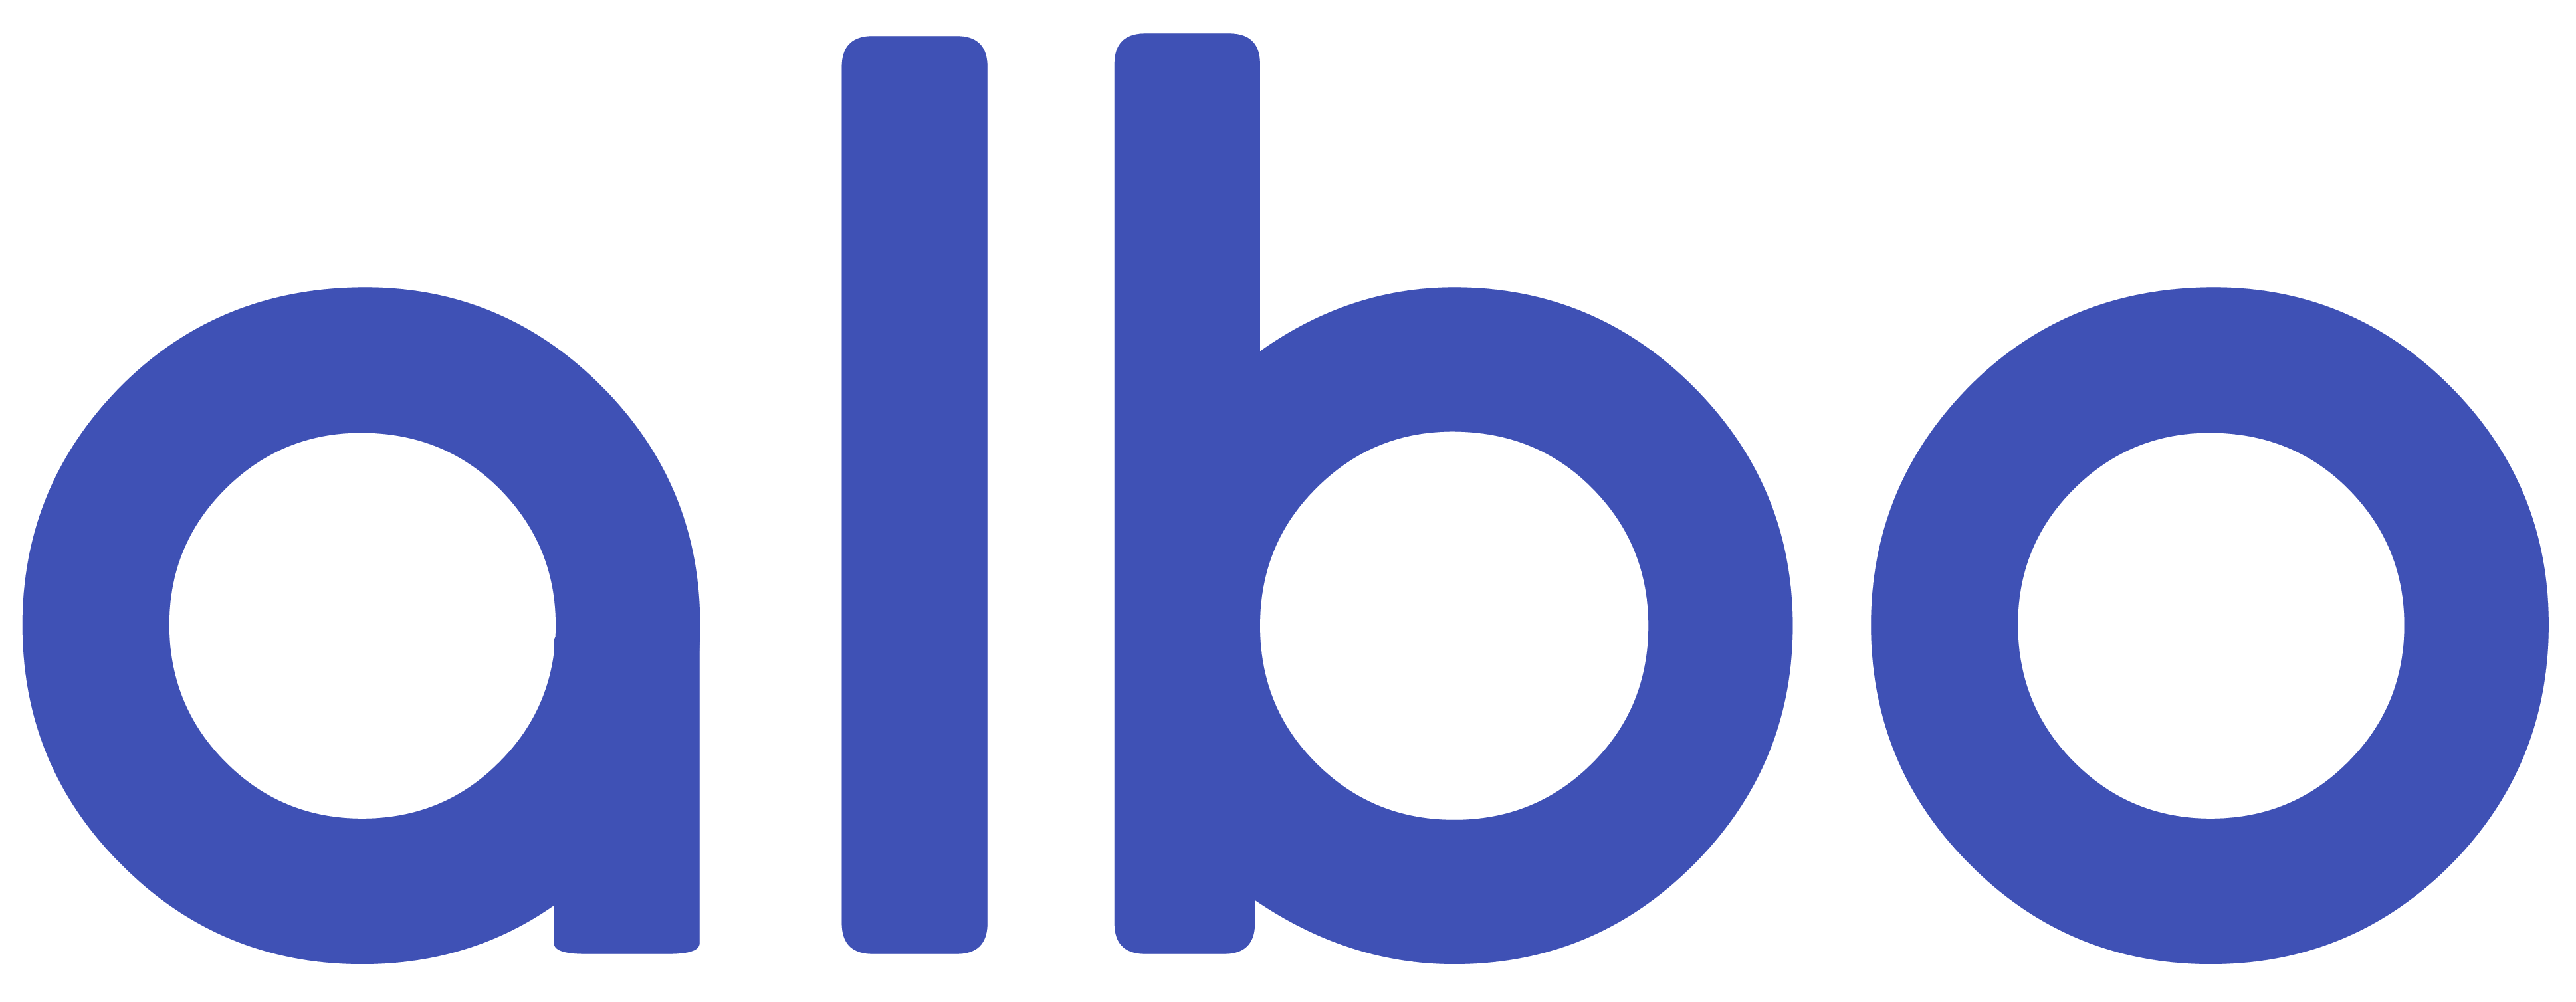 Albo uses SEON's fraud prevention system